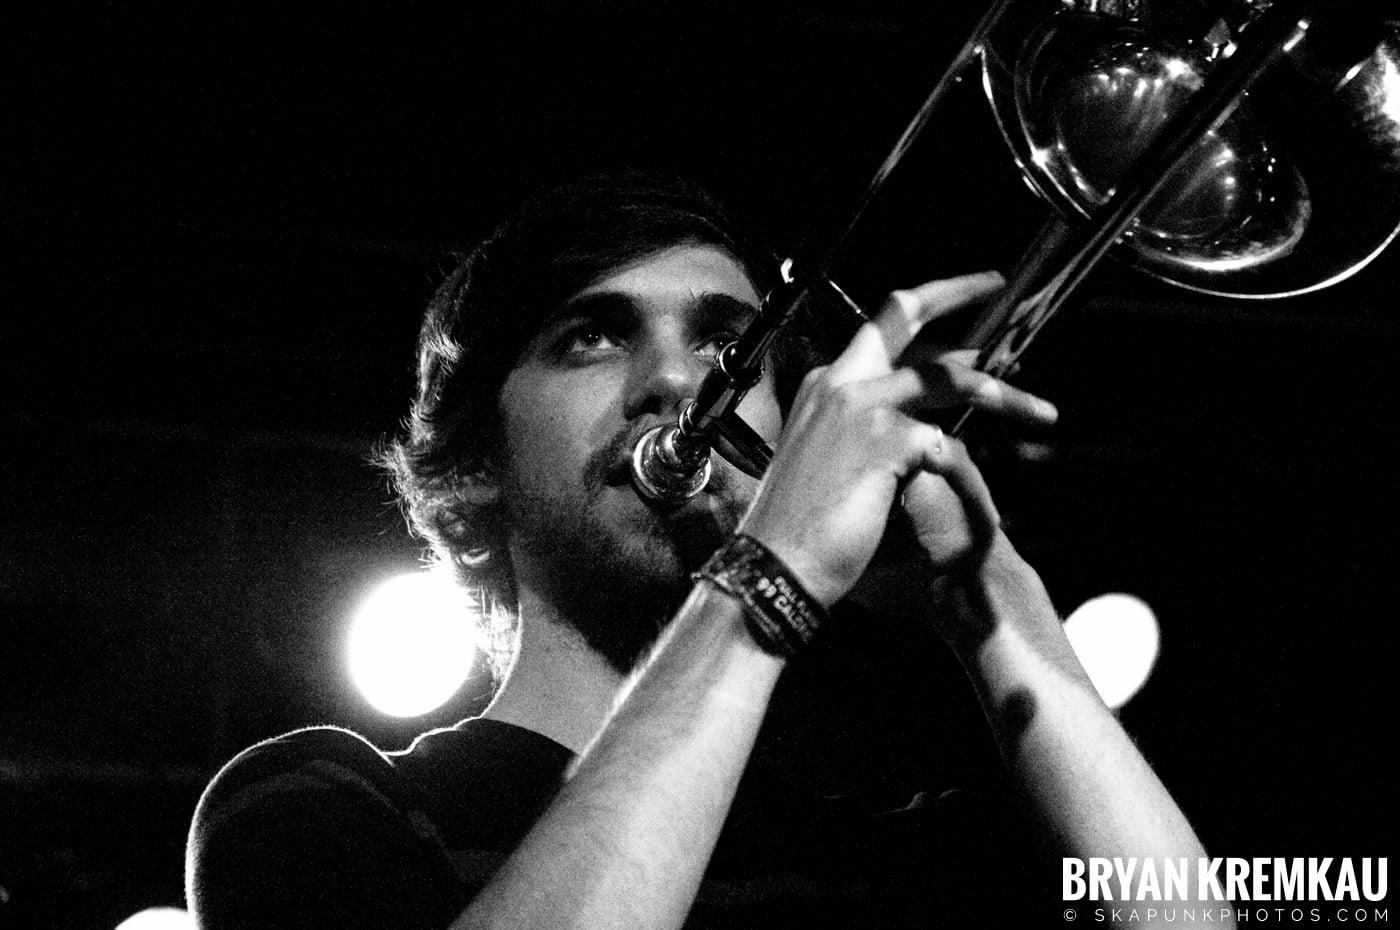 The Toasters (Ska is Dead Tour) @ Starland Ballroom, Sayreville, NJ - 11.15.09 (3)